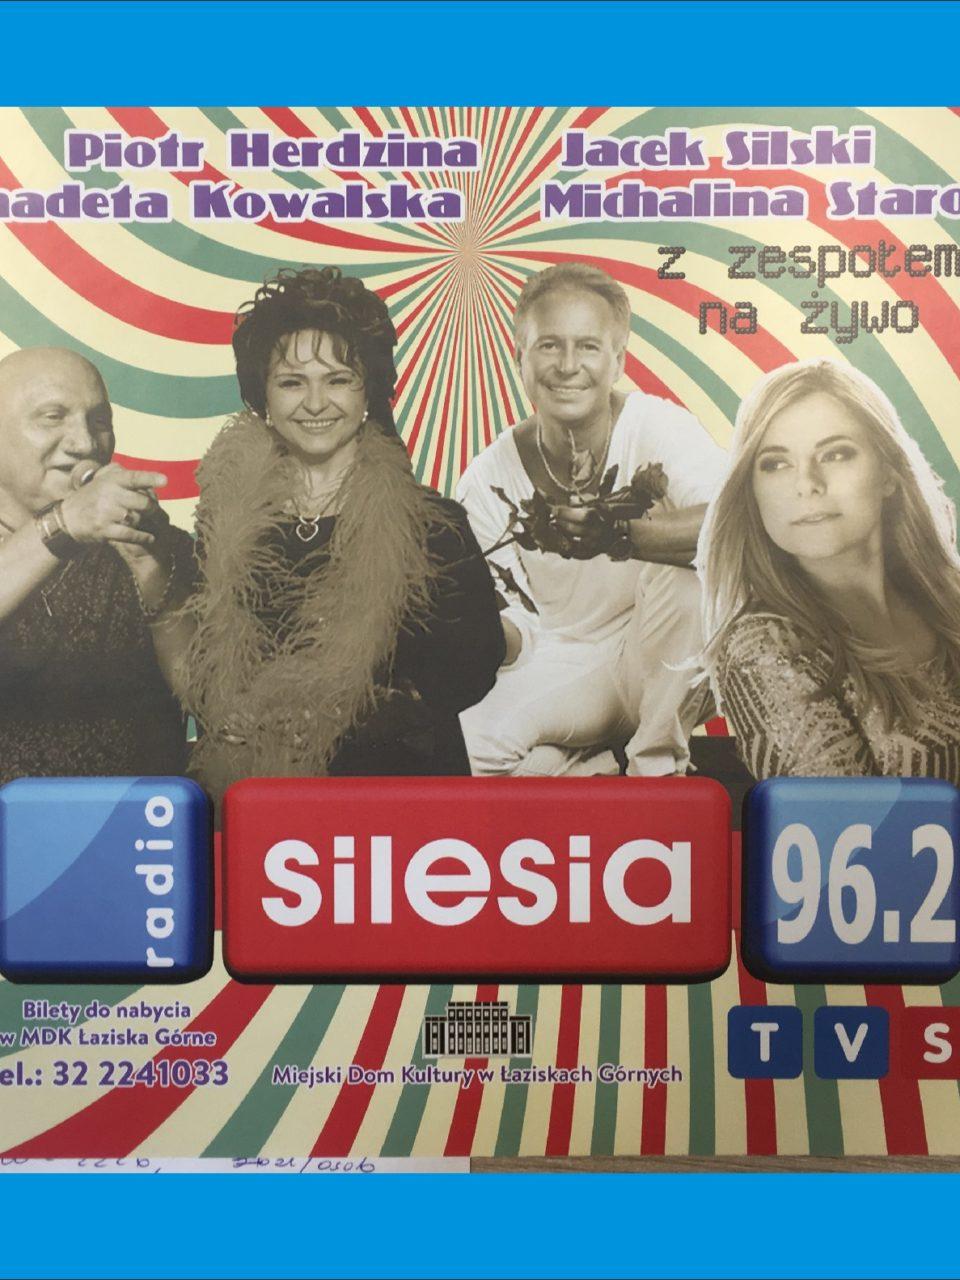 http://mdk.laziska.pl/wp-content/uploads/2018/05/silesia-na-strone-960x1280.jpg